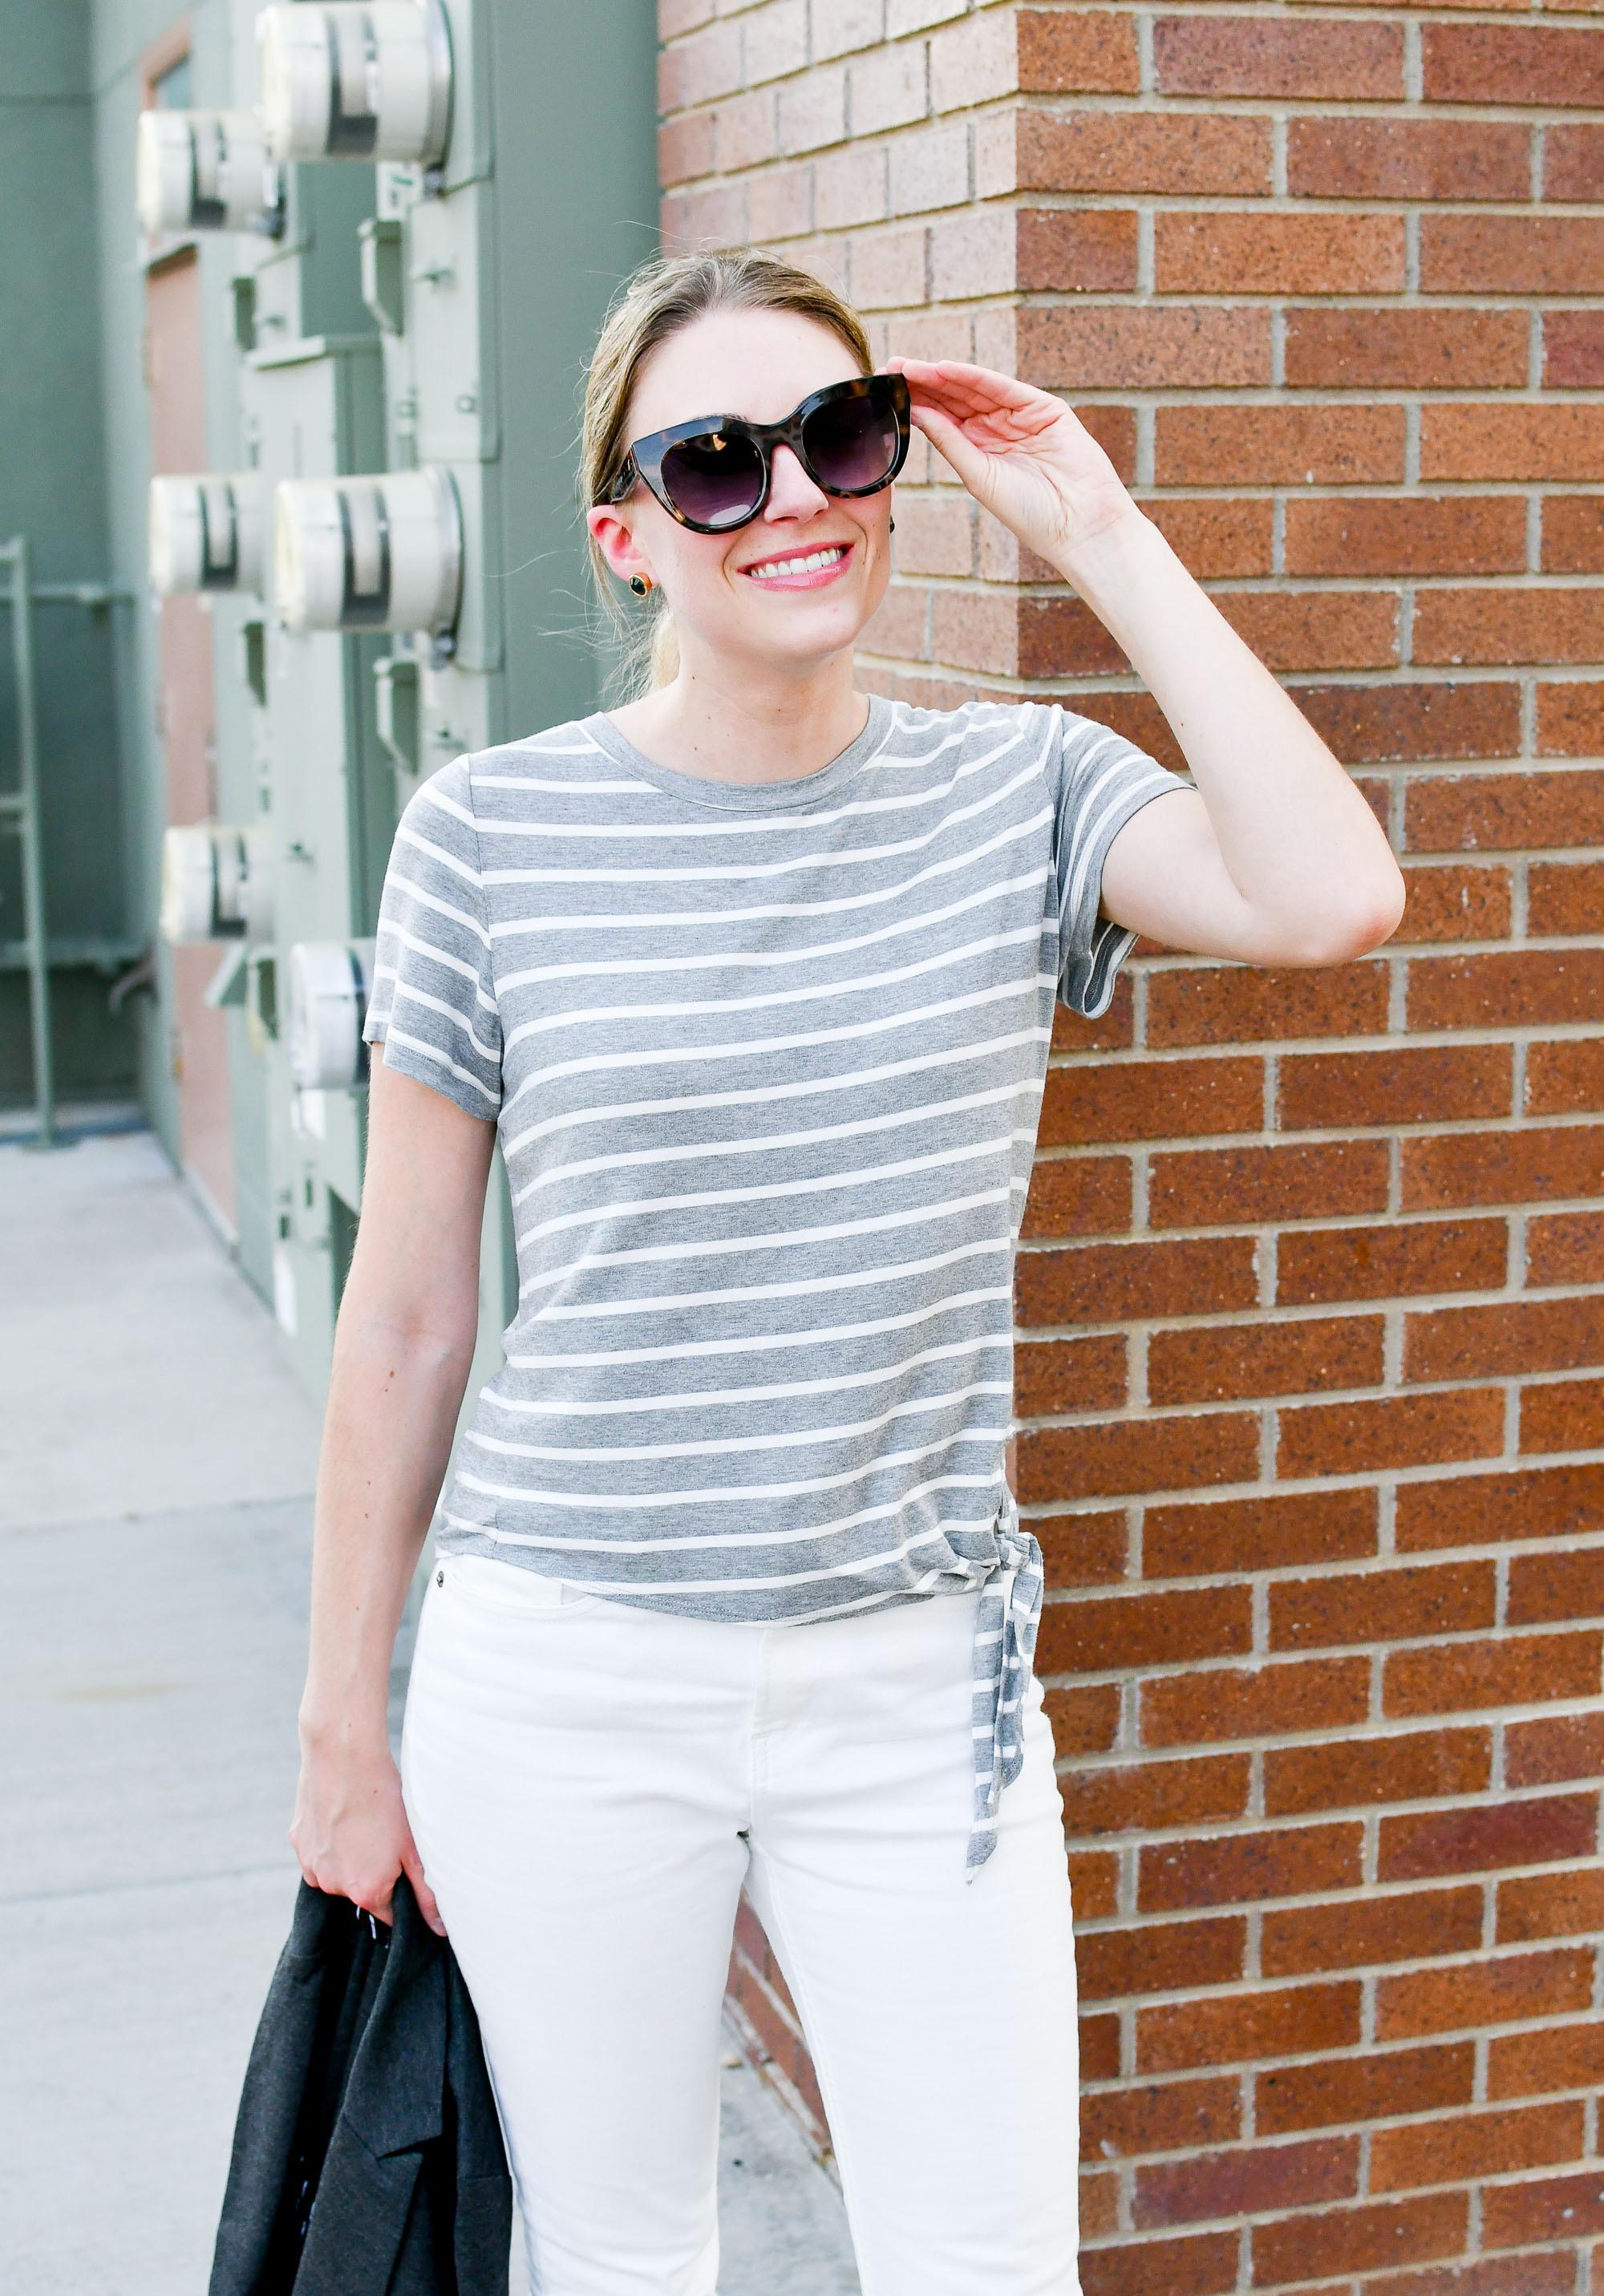 Amour Vert 'Julita' striped side-tie tee — Cotton Cashmere Cat Hair